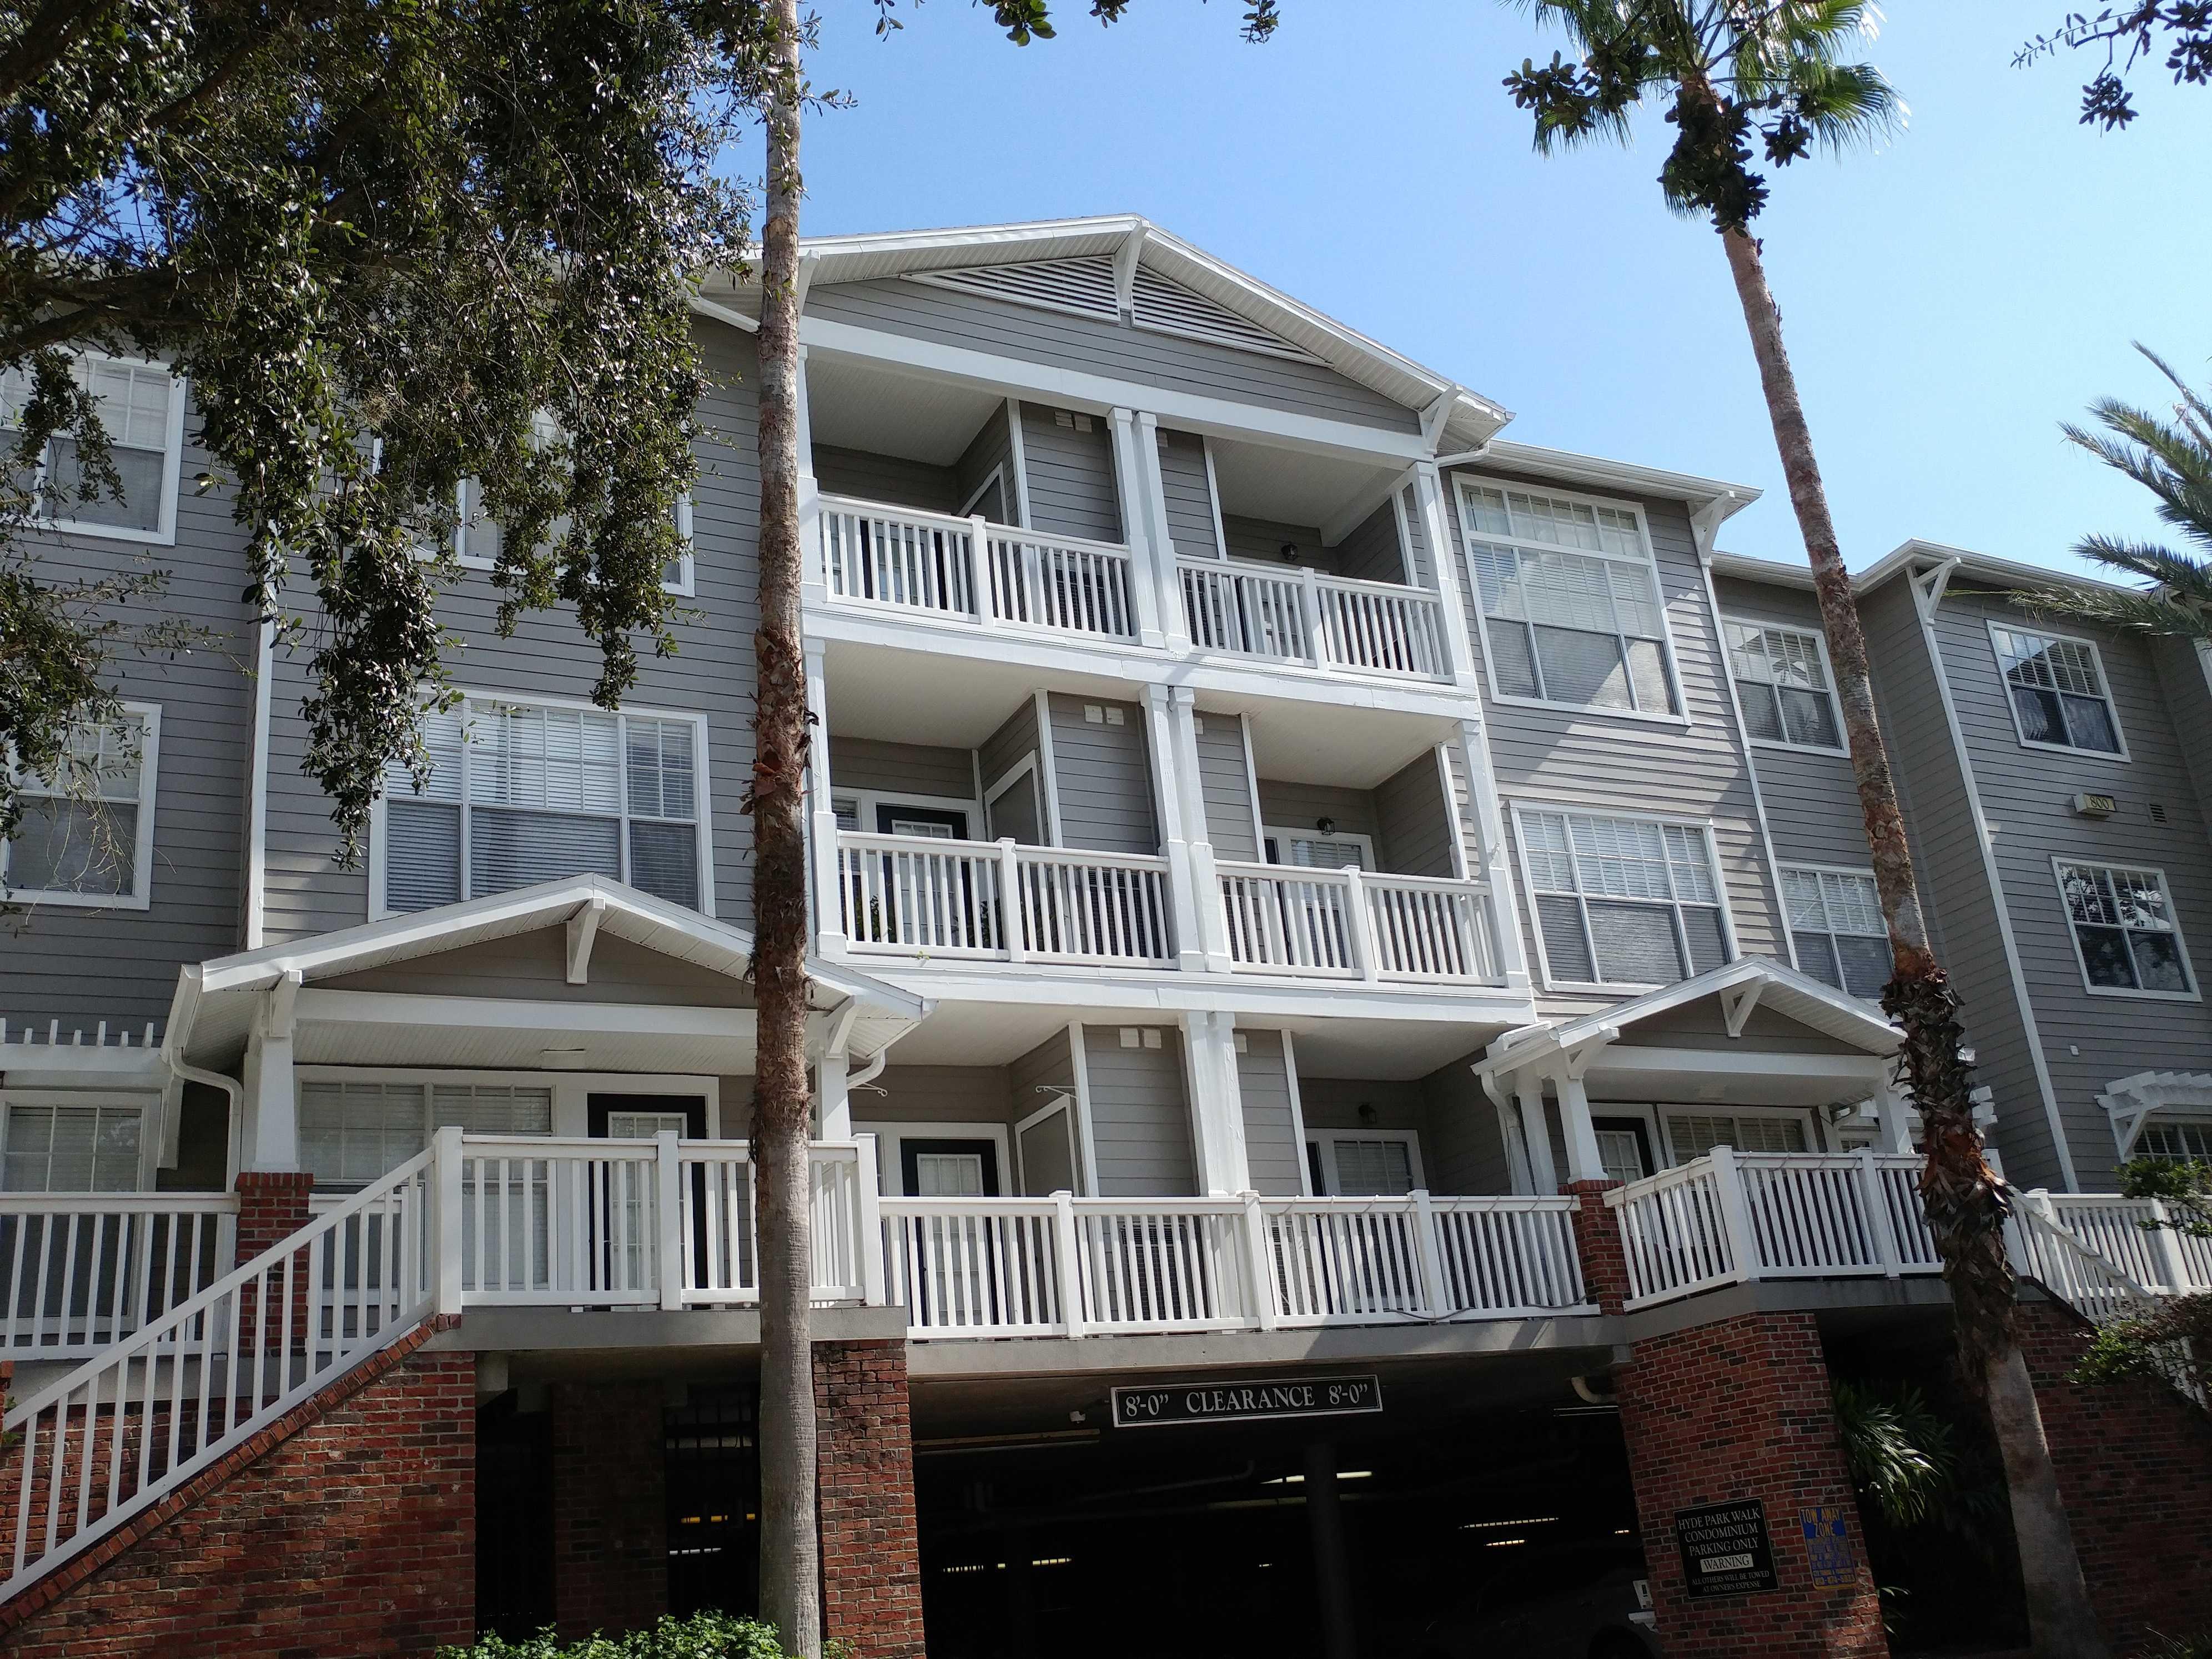 Tampa Condo Rentals In Tampa Condos For Rent In Tampa Florida